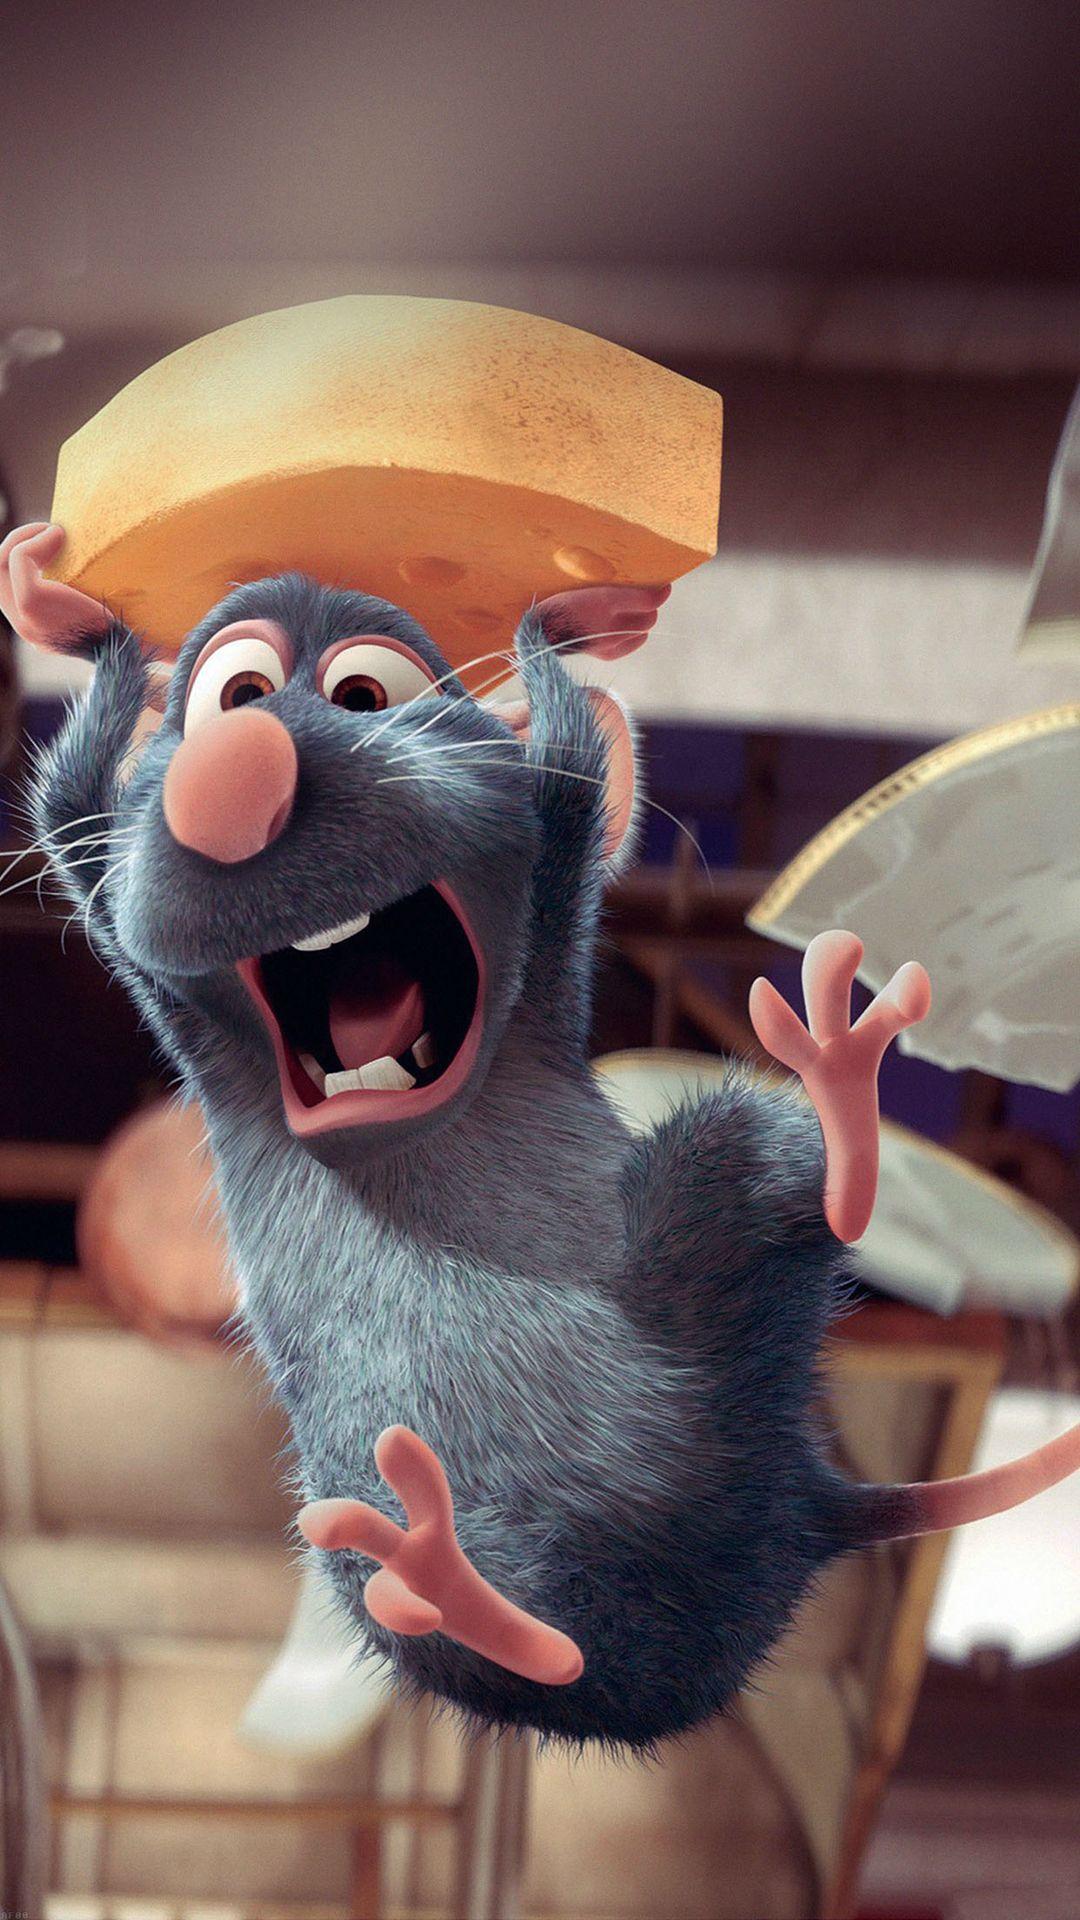 pinterest: @jaidyngrace >>> ratatouille disney pixar ☆ download